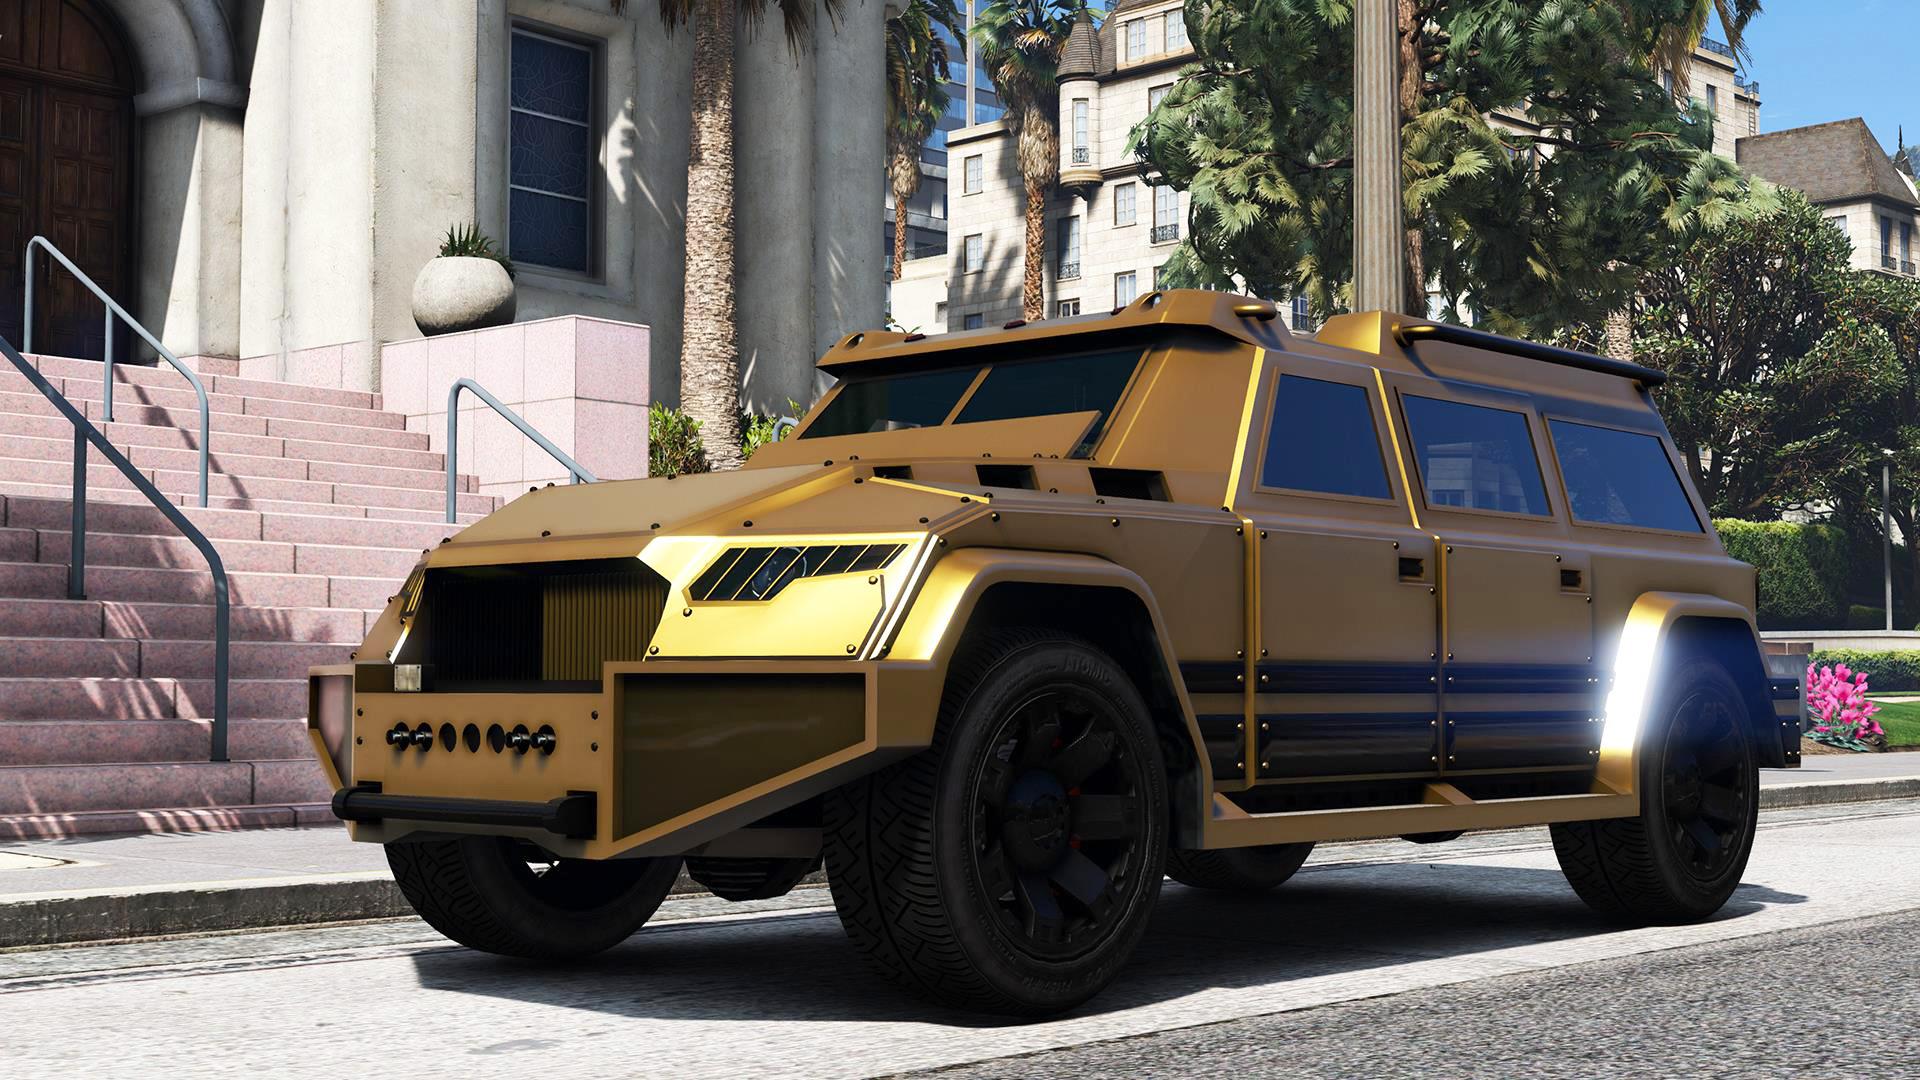 Dartz S Newest Suv Immortalized In Quot Grand Theft Auto V Quot